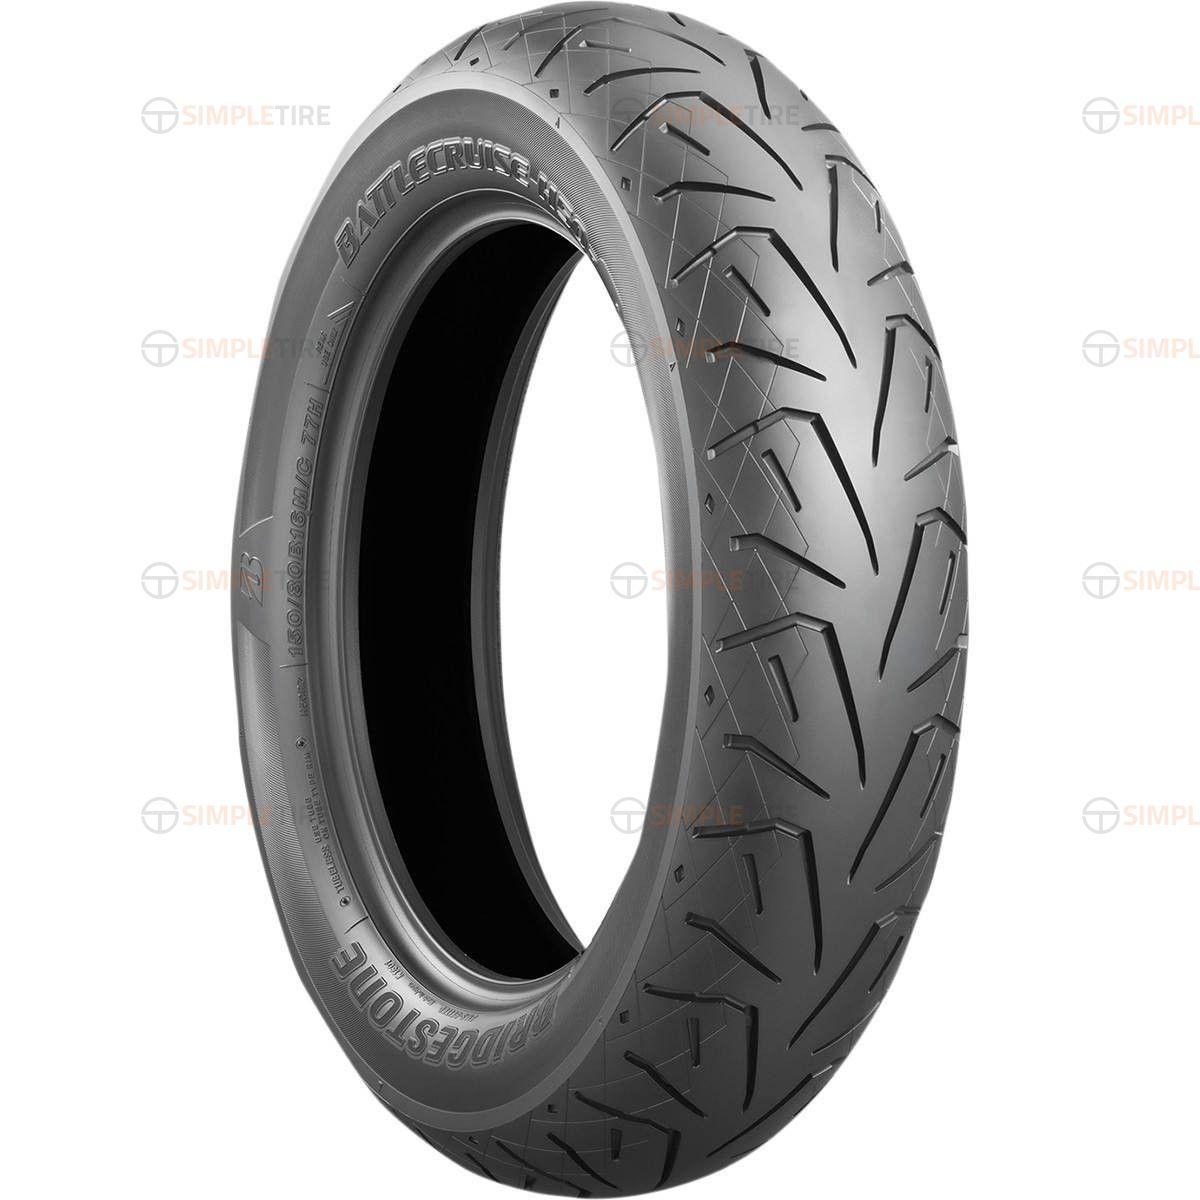 006915 160/70R17 Battlecruise H50 (Rear) Bridgestone